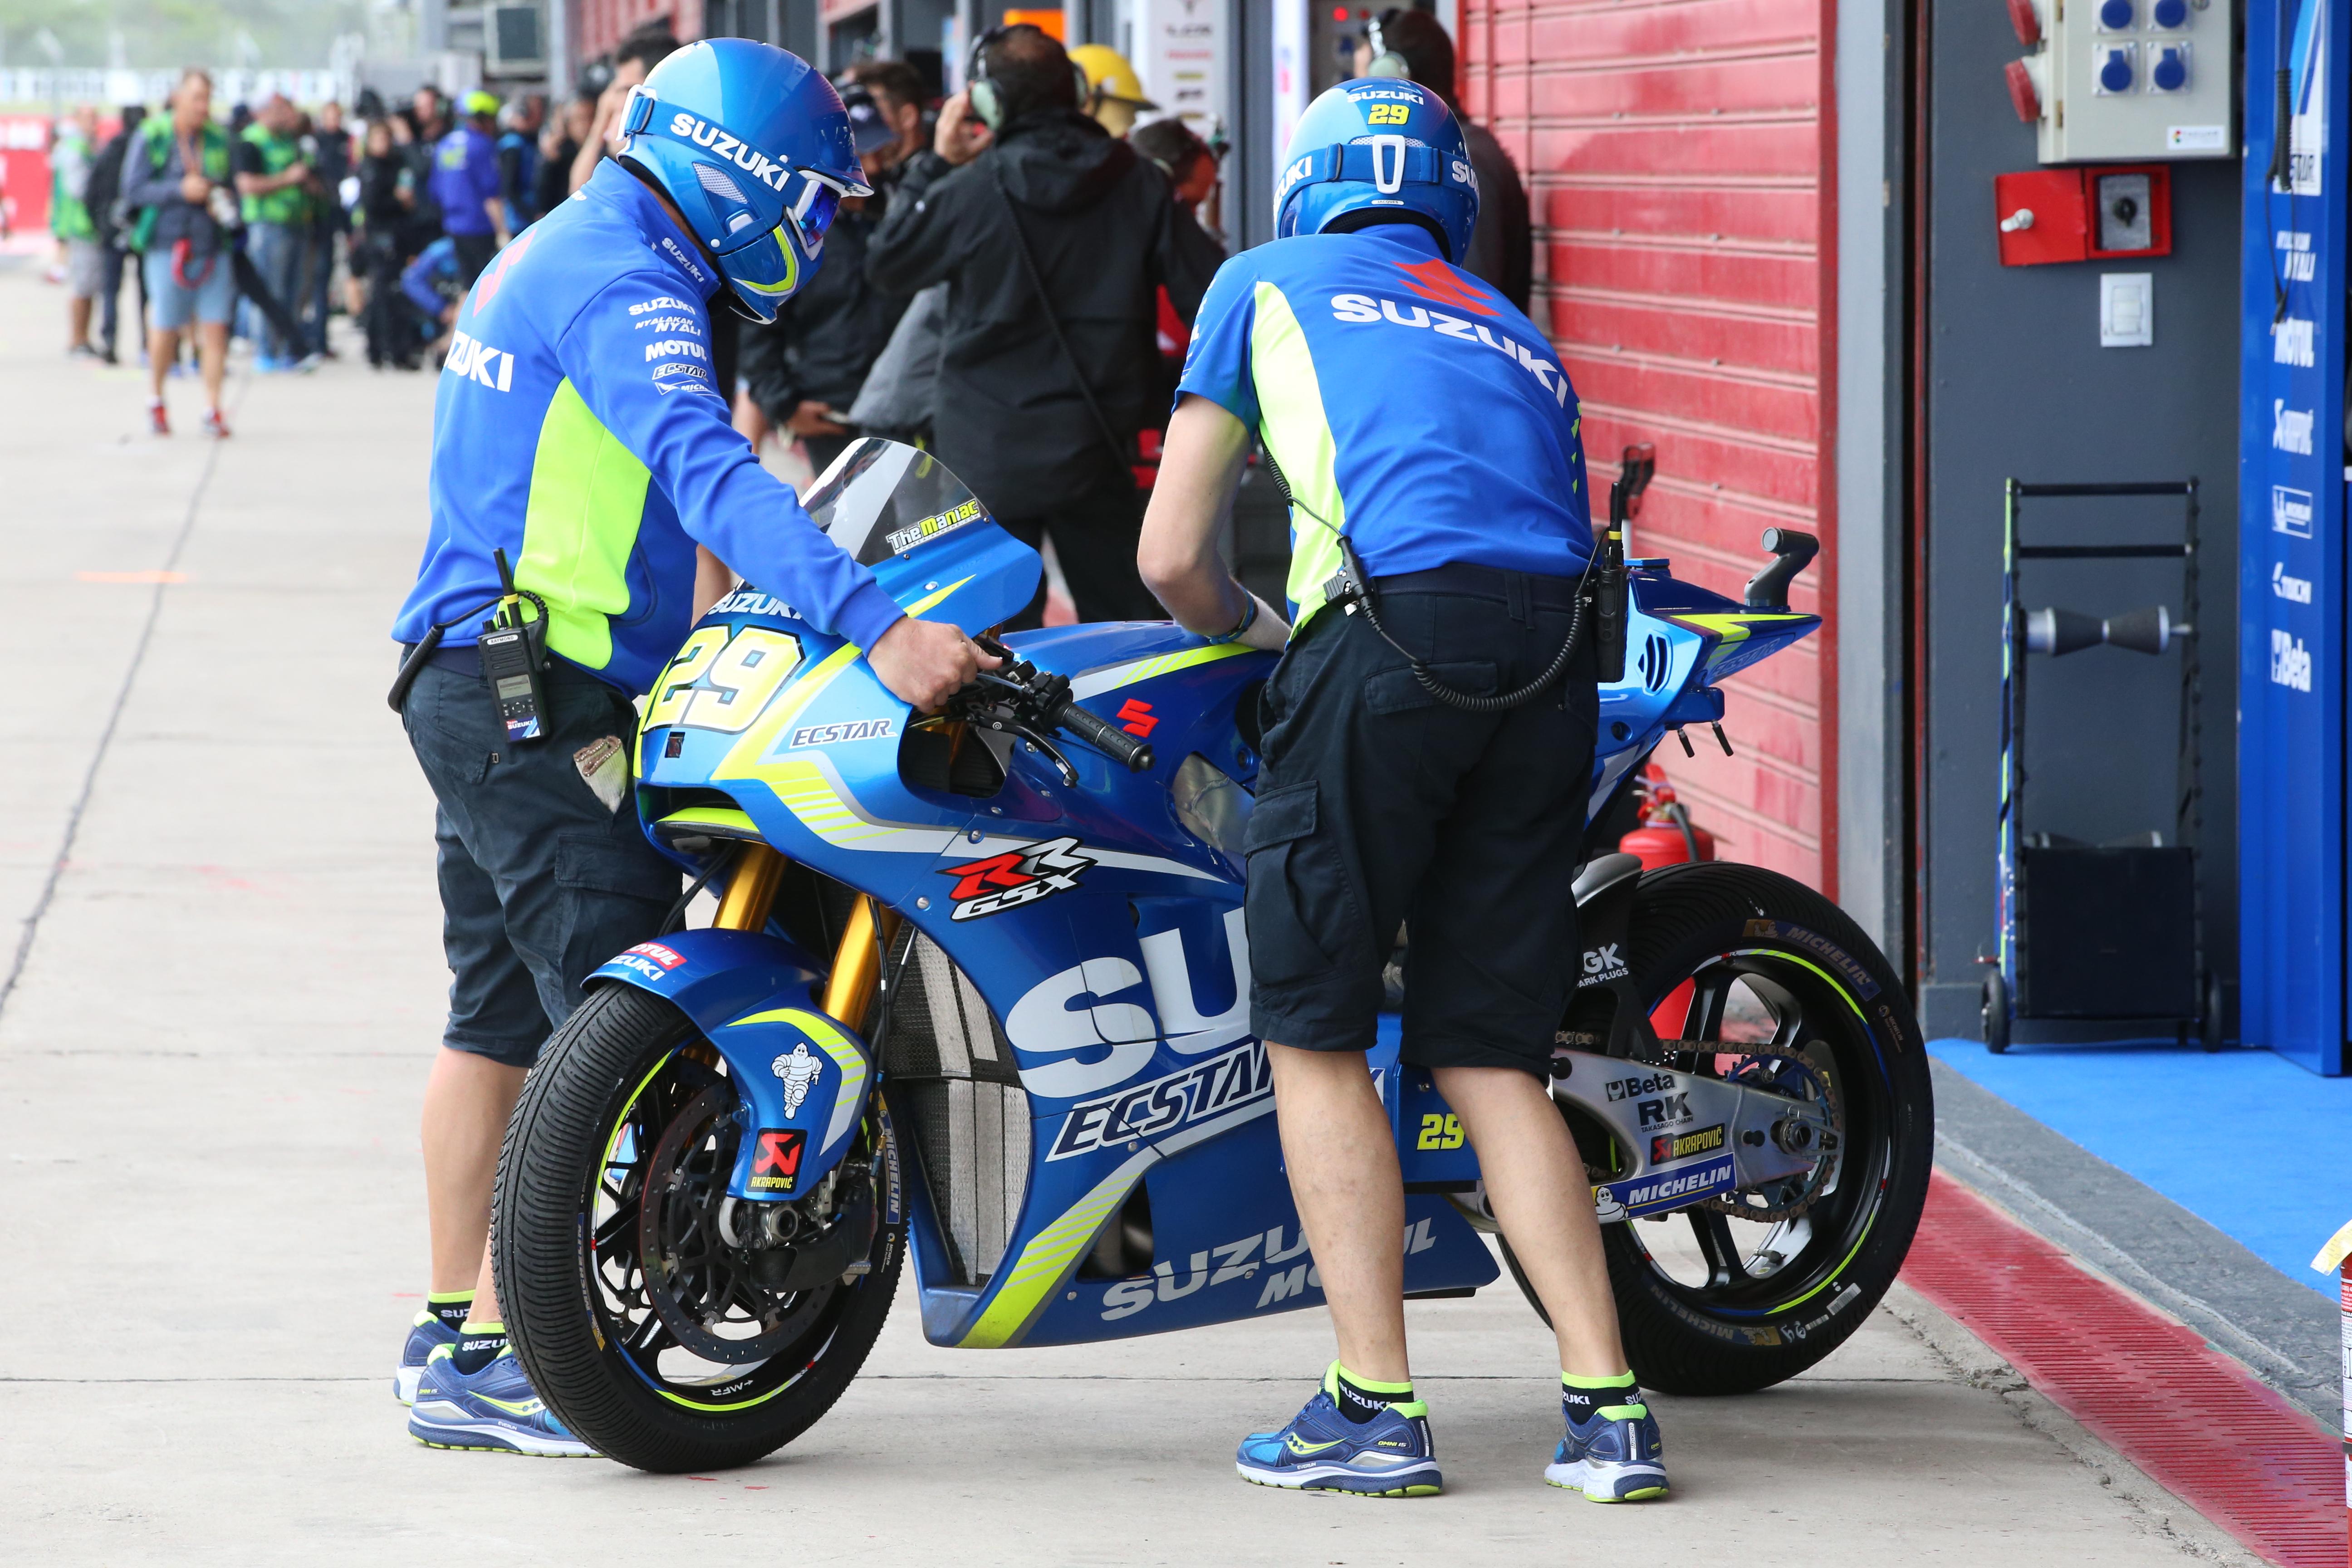 Argentina: MotoGP Parts